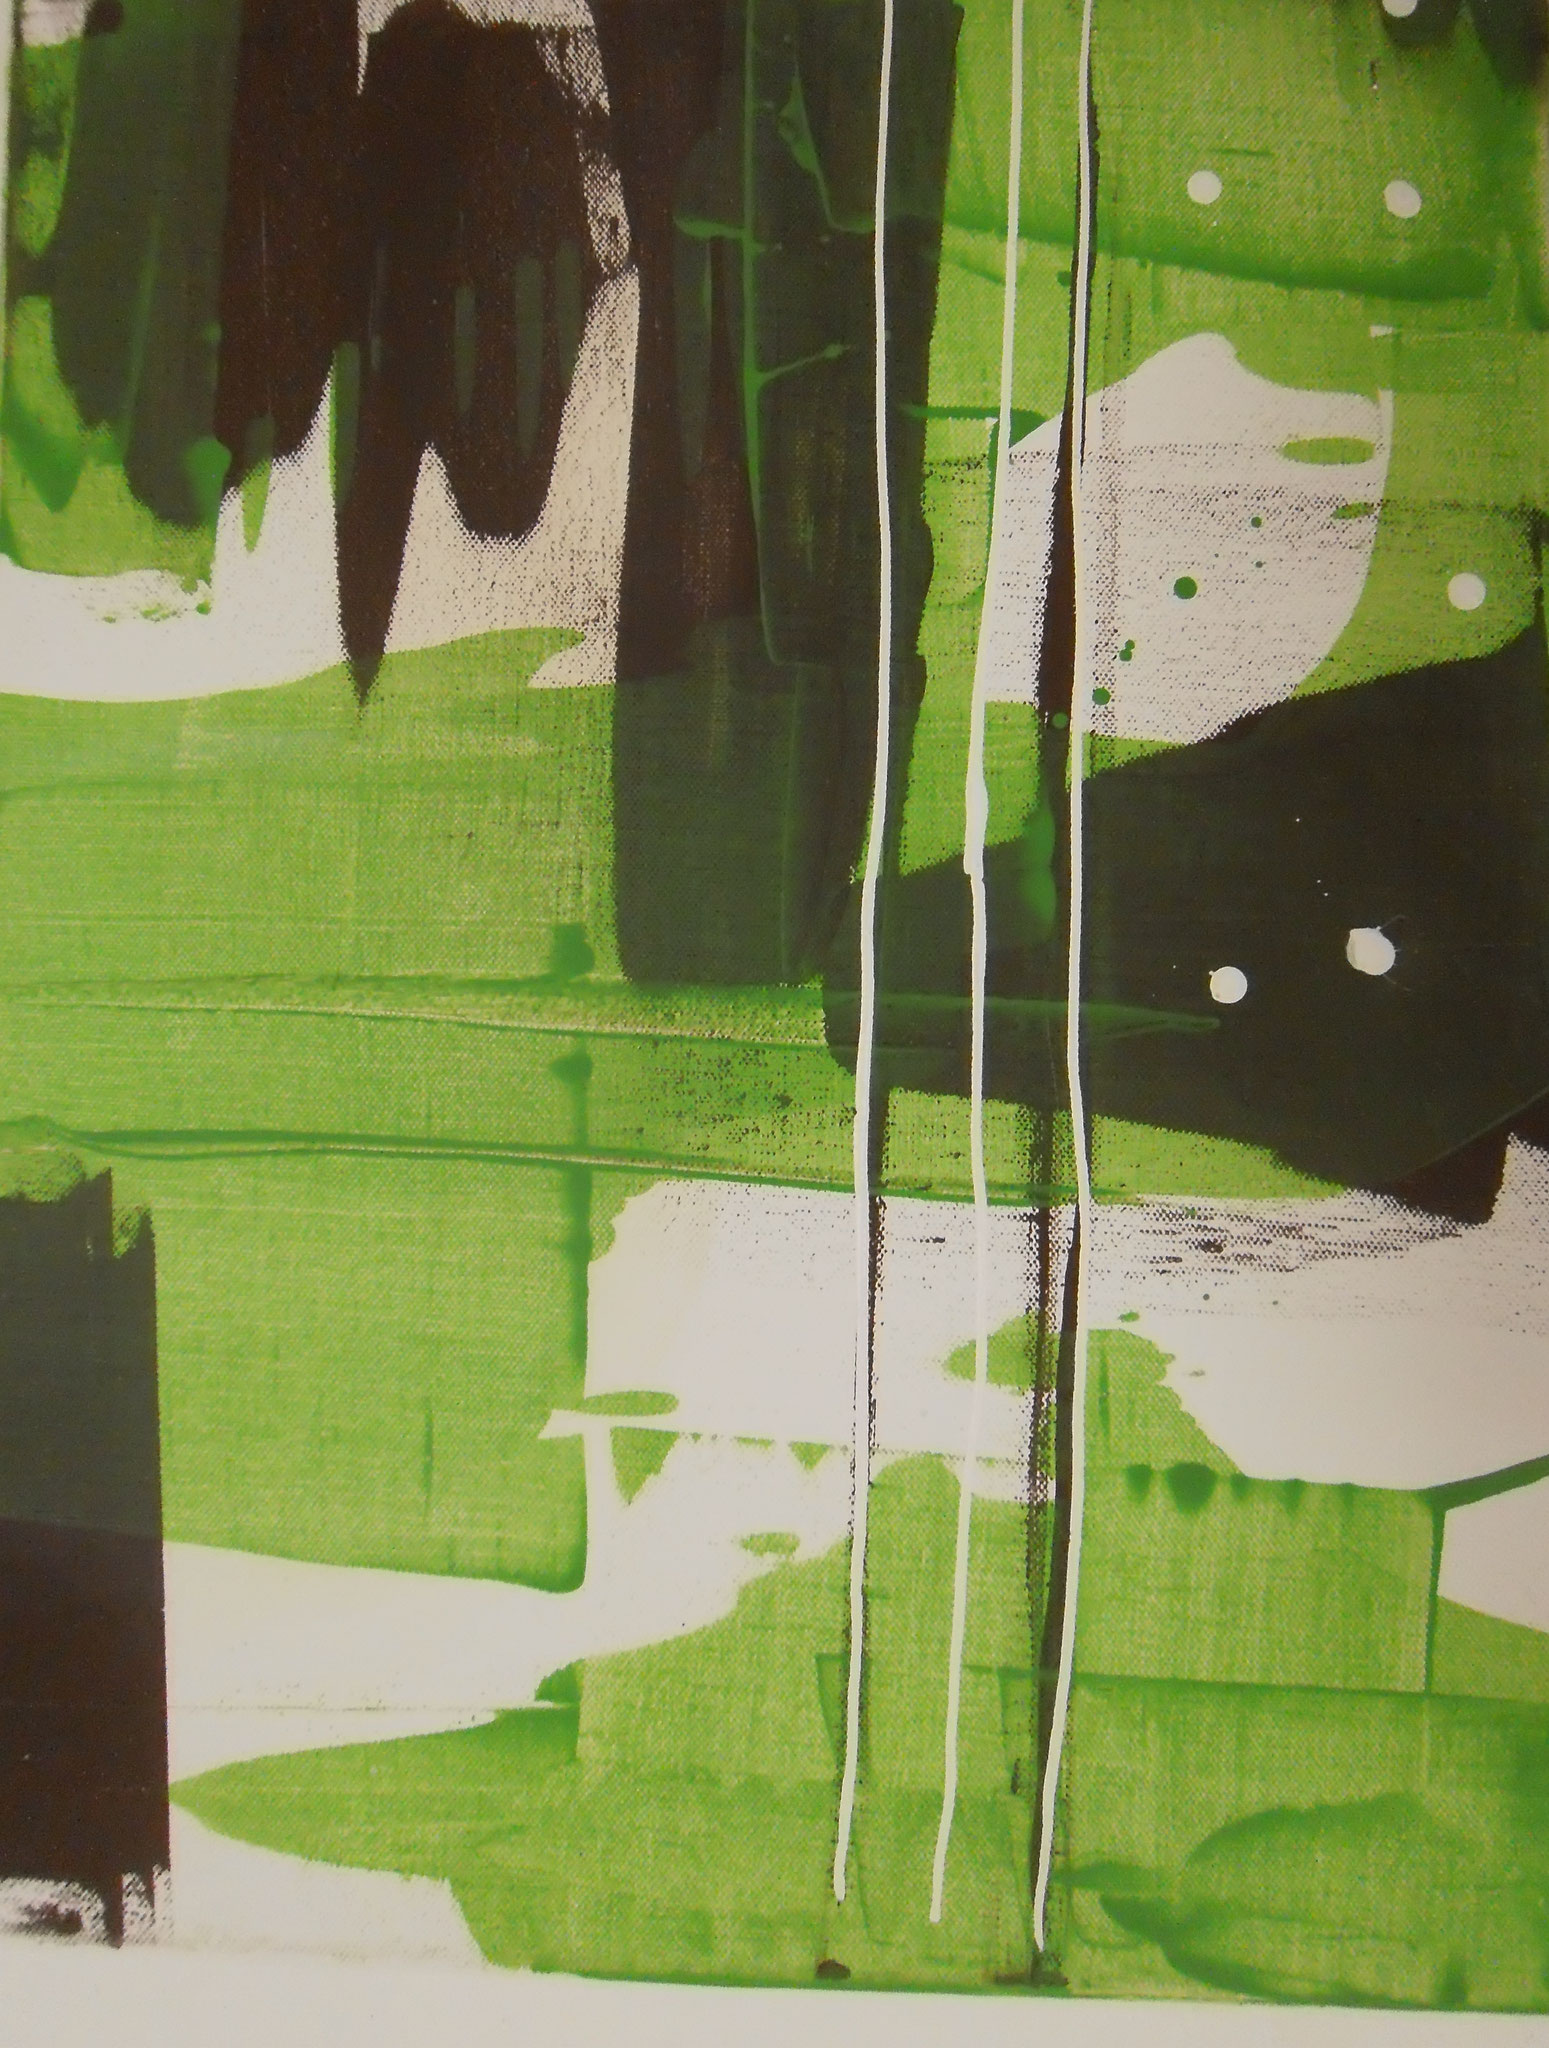 Rana Verde I 50 x 40 x 4 cm